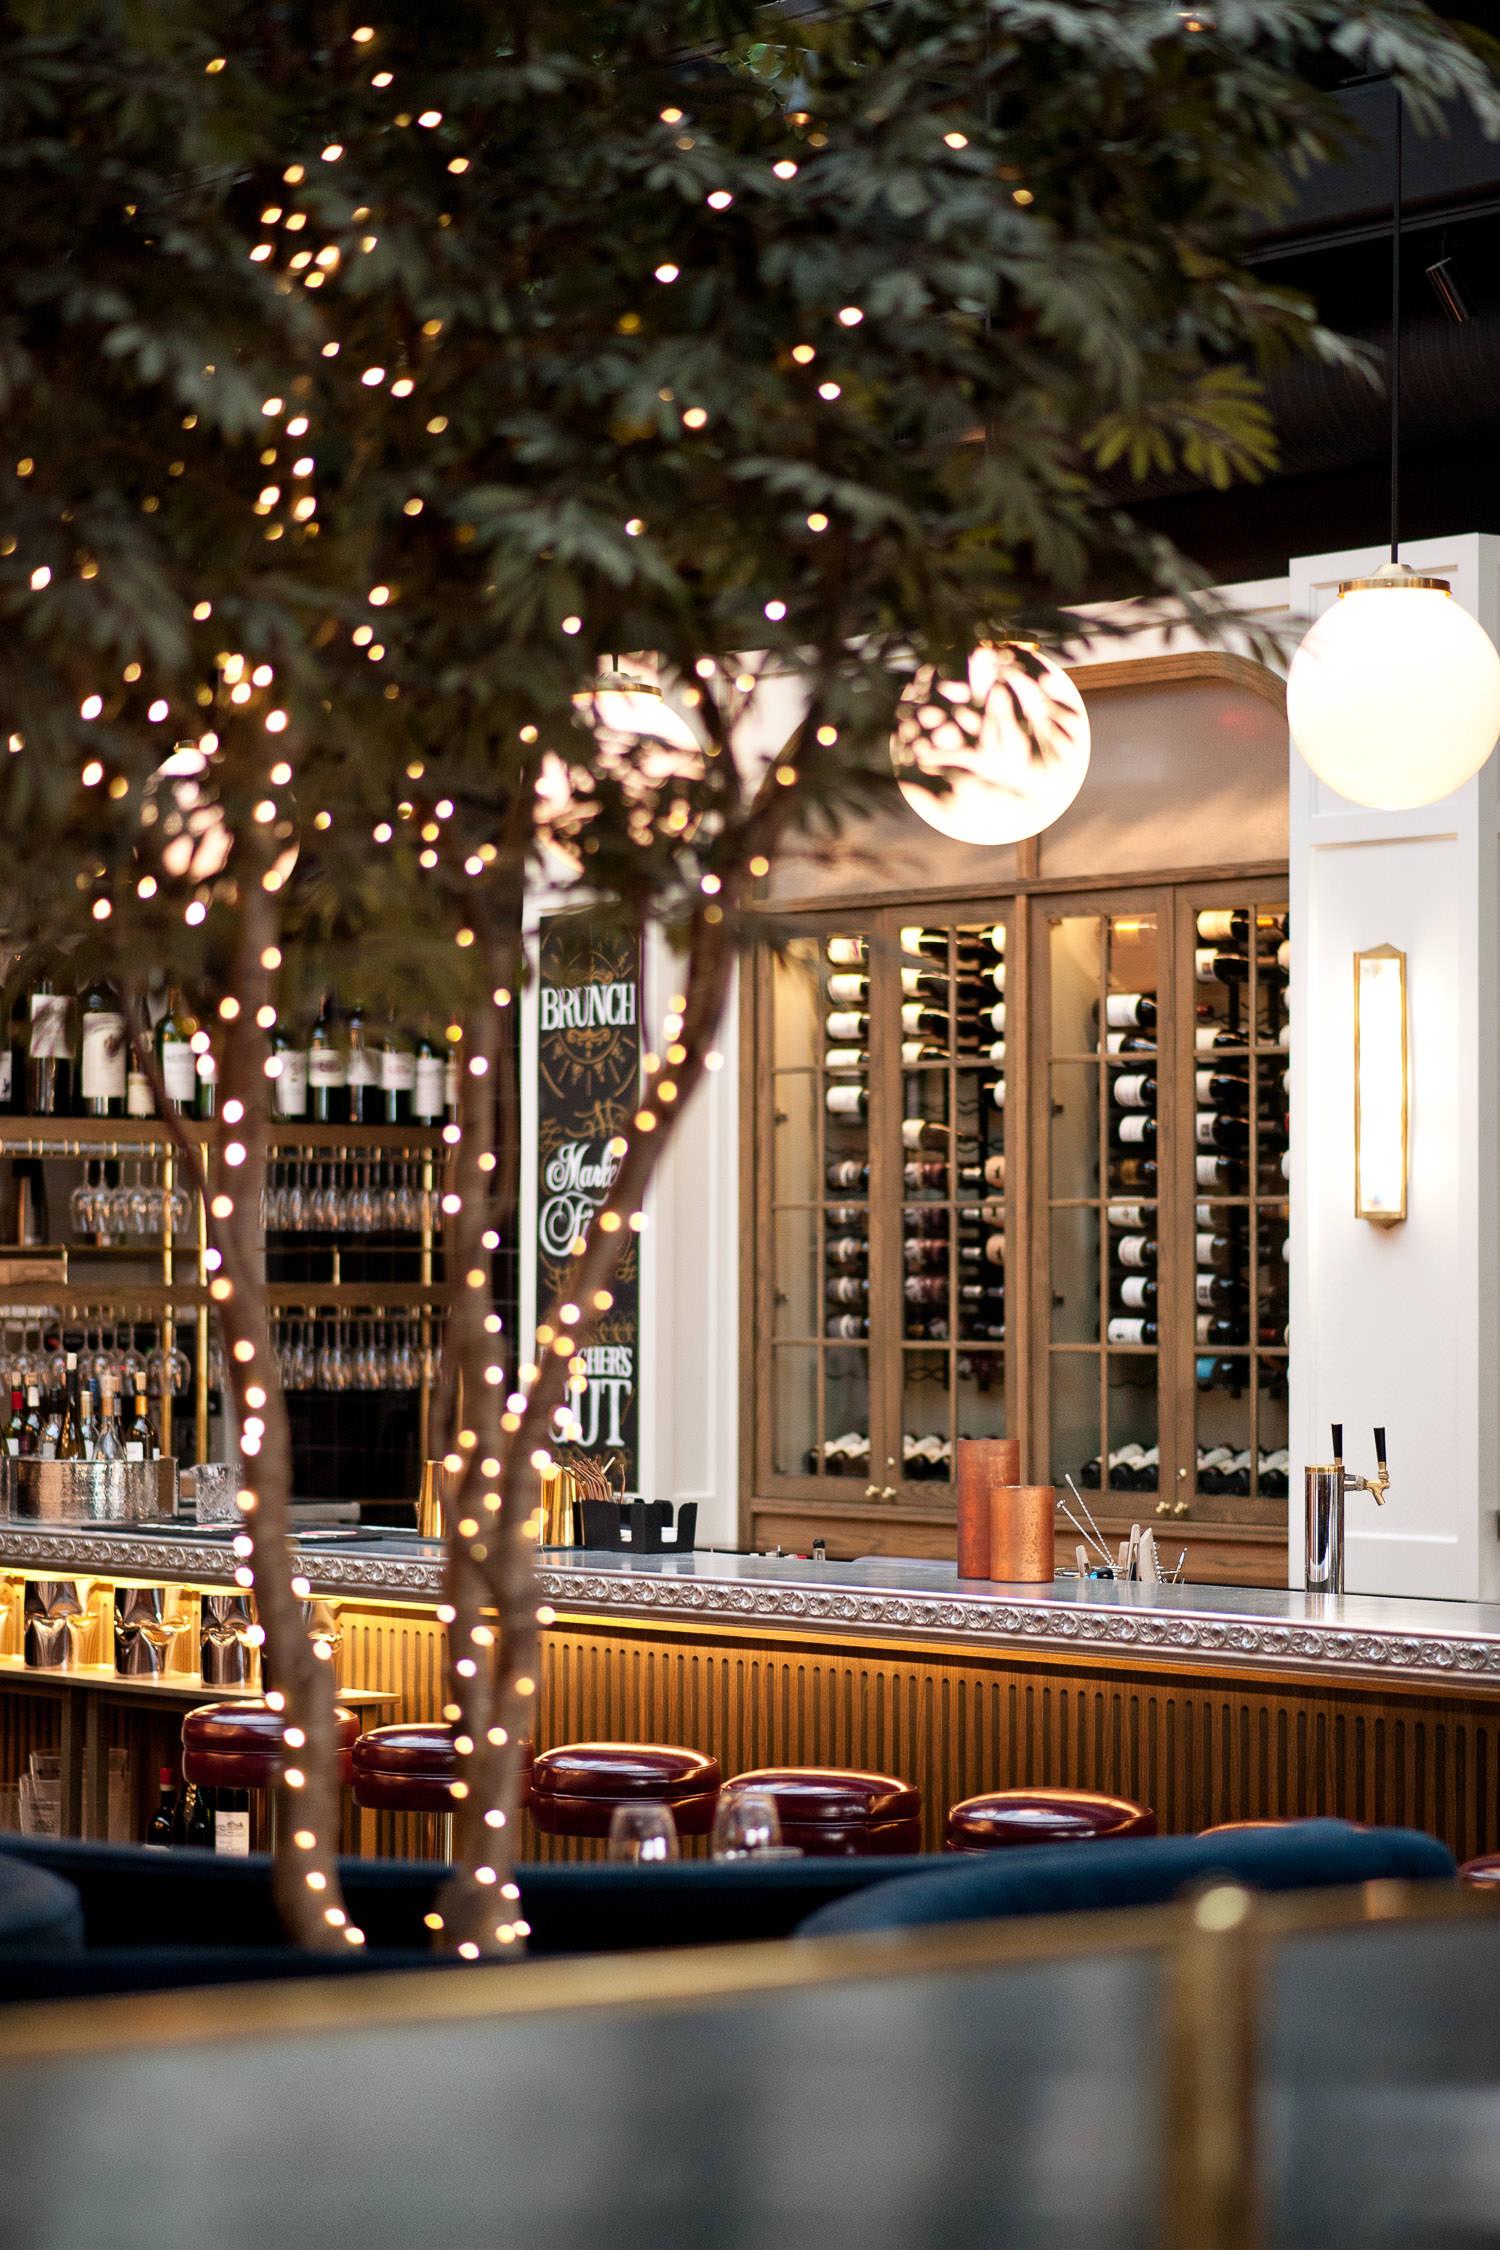 interior of Royale restaurant on 17th Avenue captured by Calgary wedding photographer Tara Whittaker